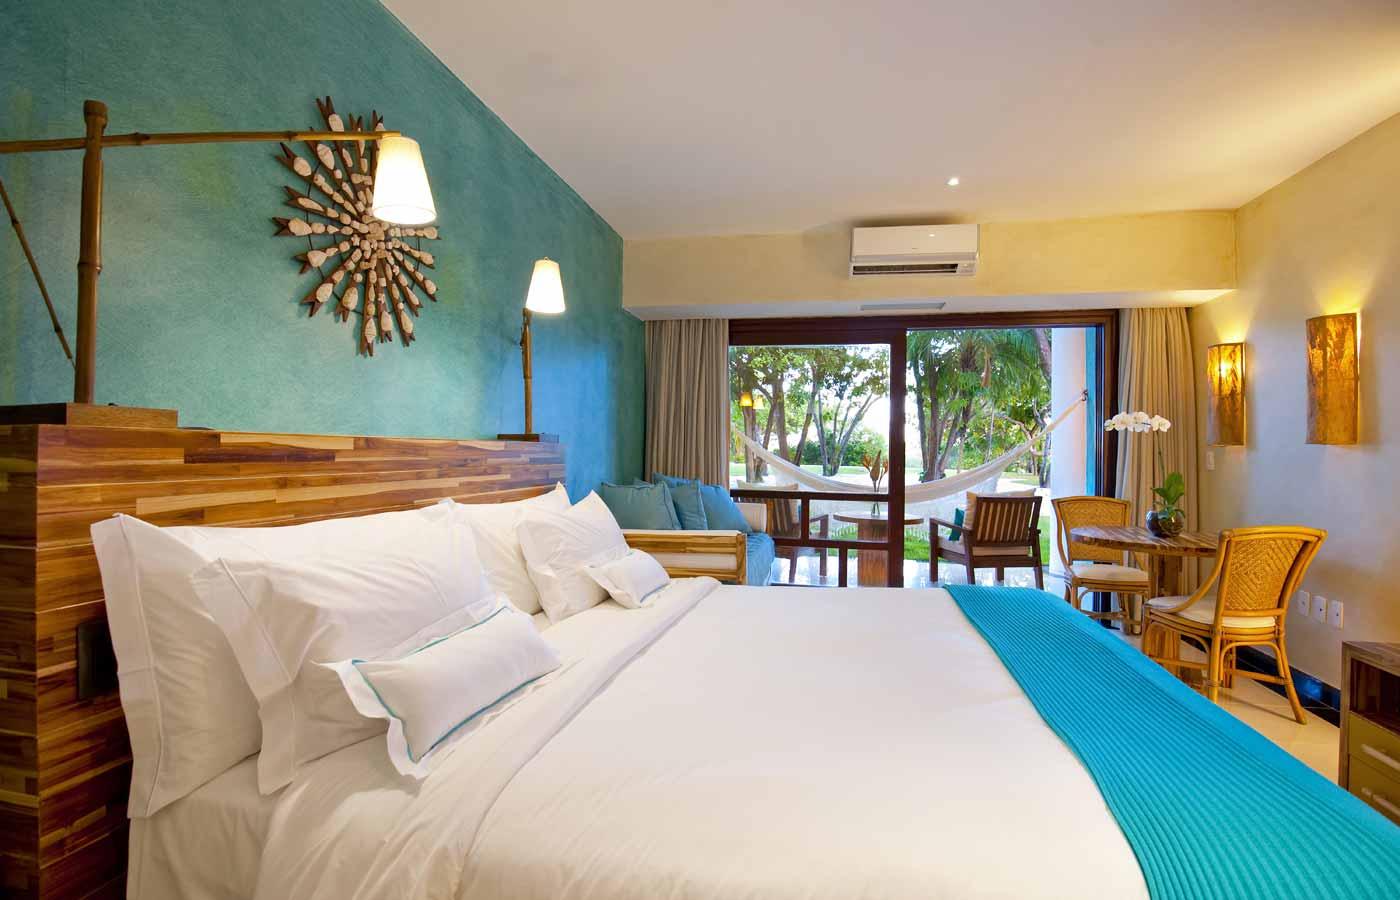 Tivoli Ecoresort - Luxury holidays to Praia do Forte, Brazil